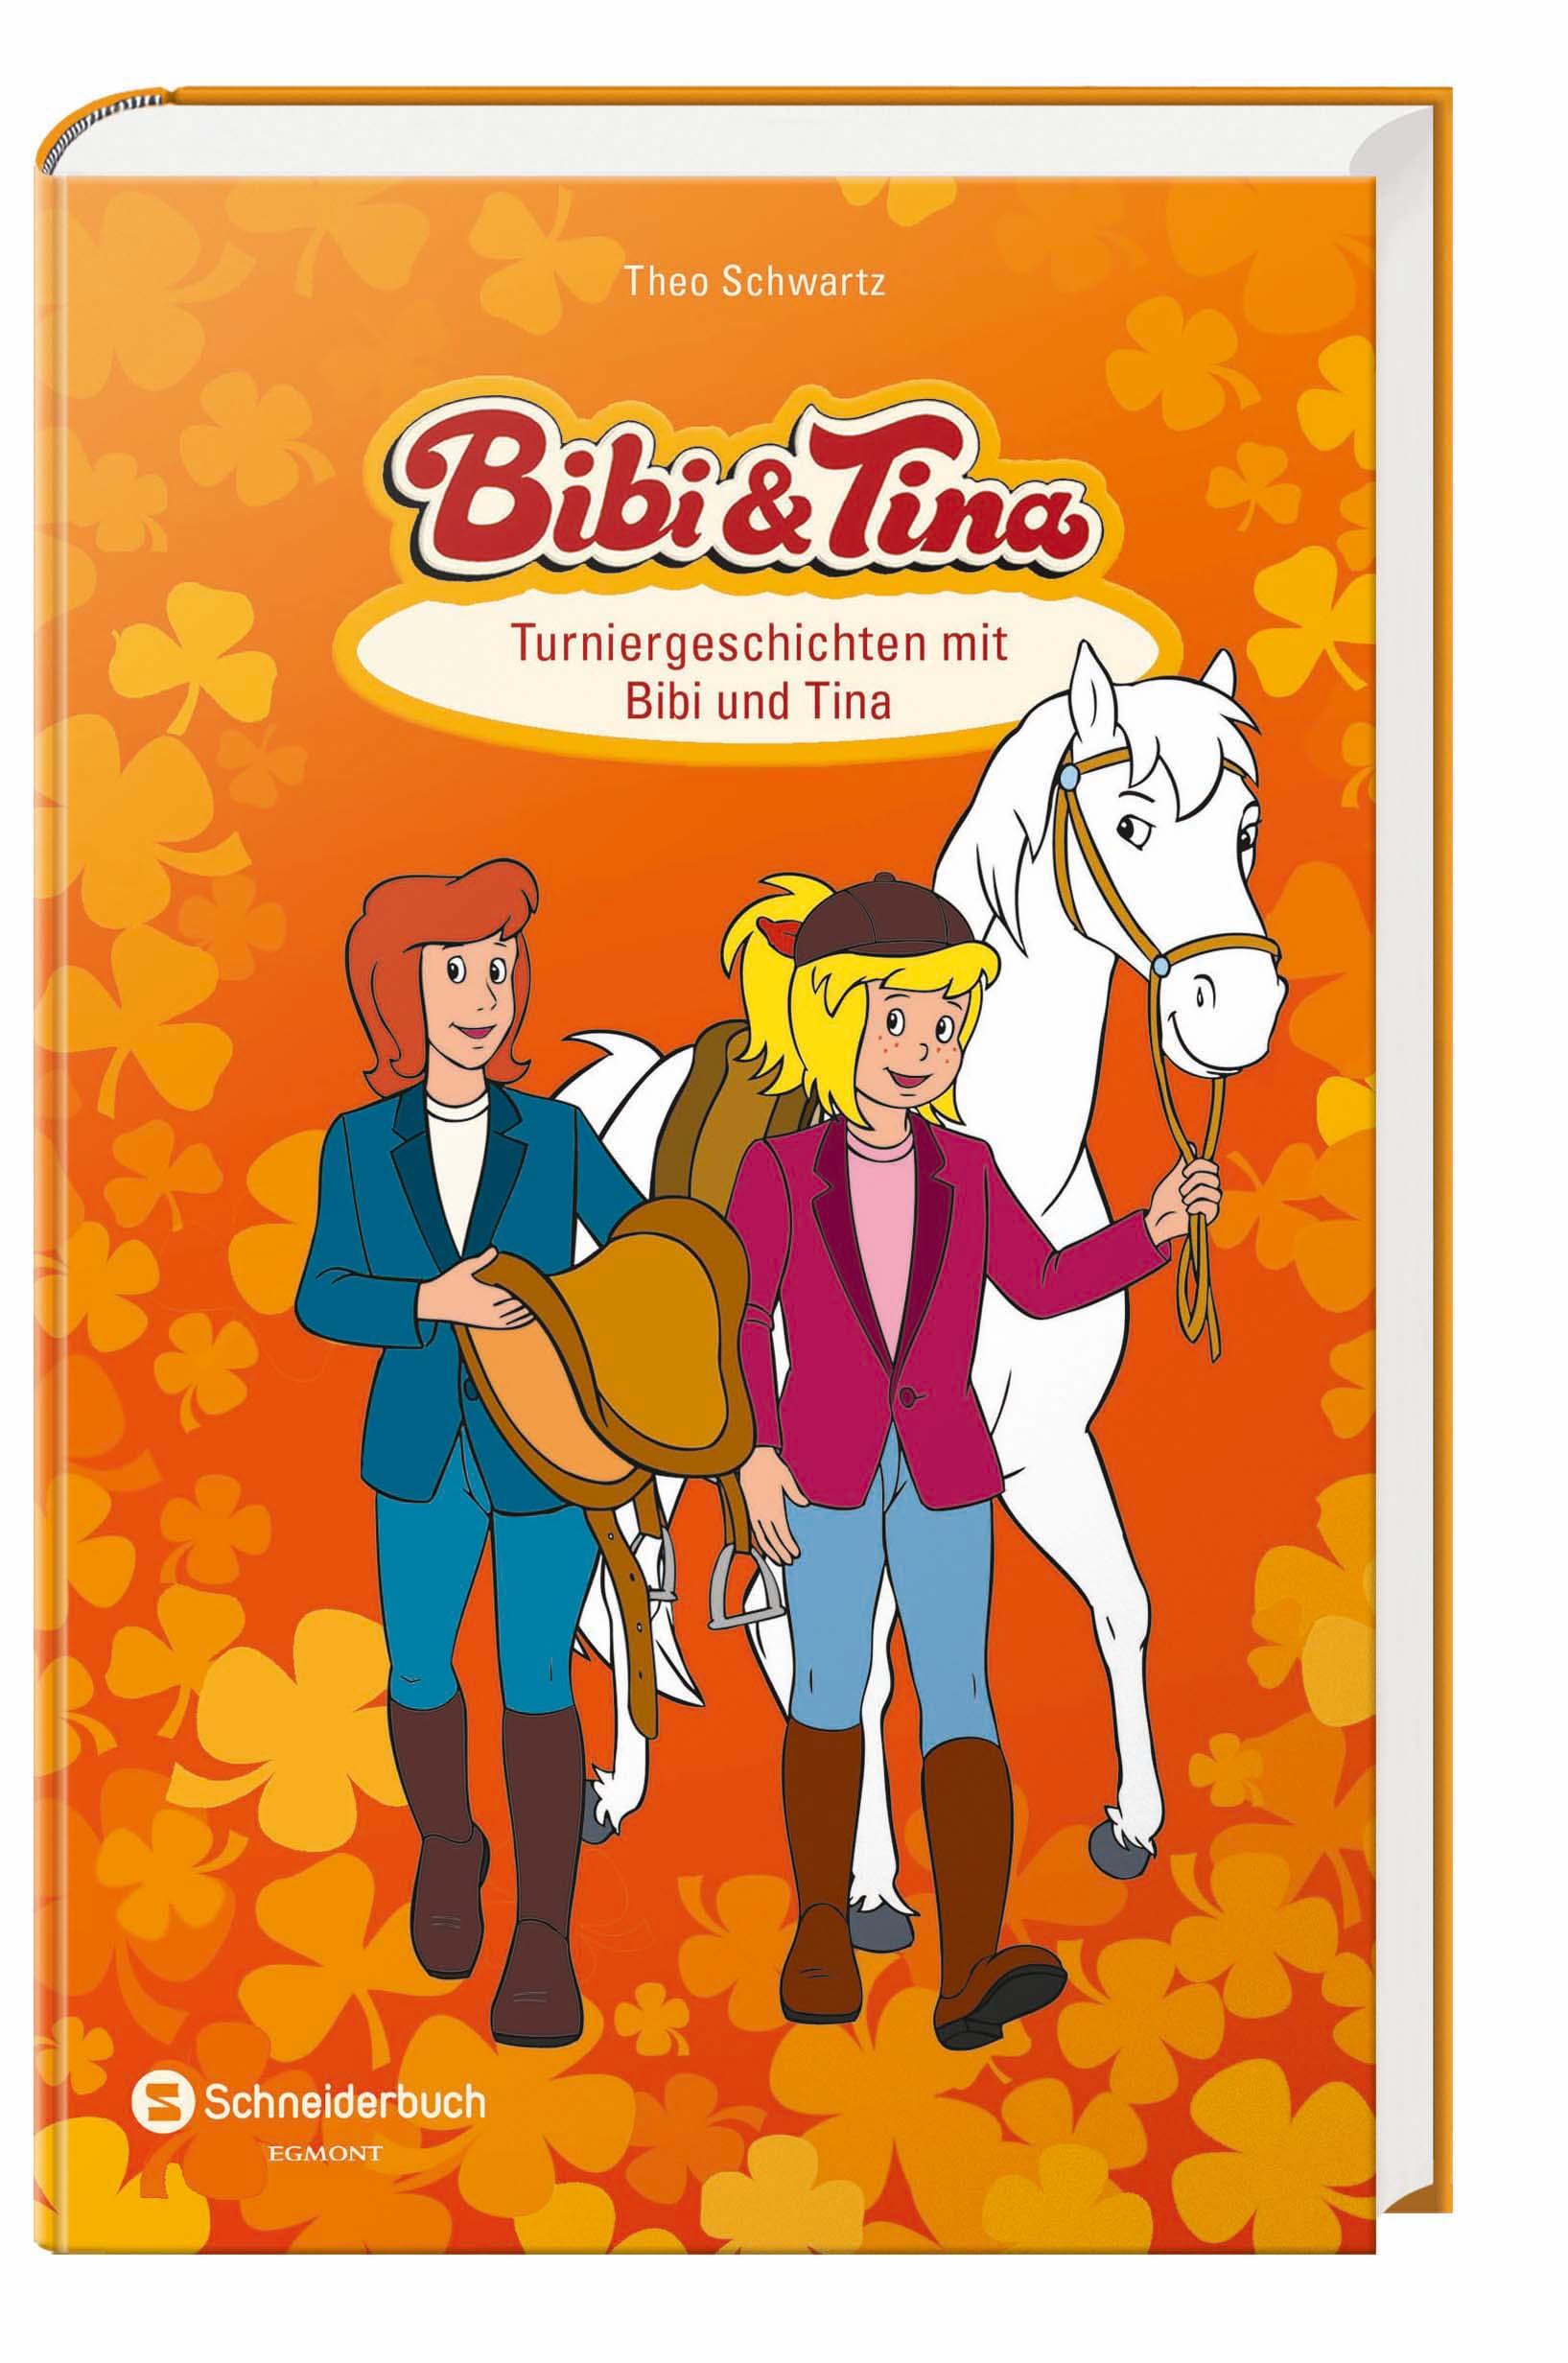 Bibi & Tina: Turniergeschichten mit Bibi & Tina...